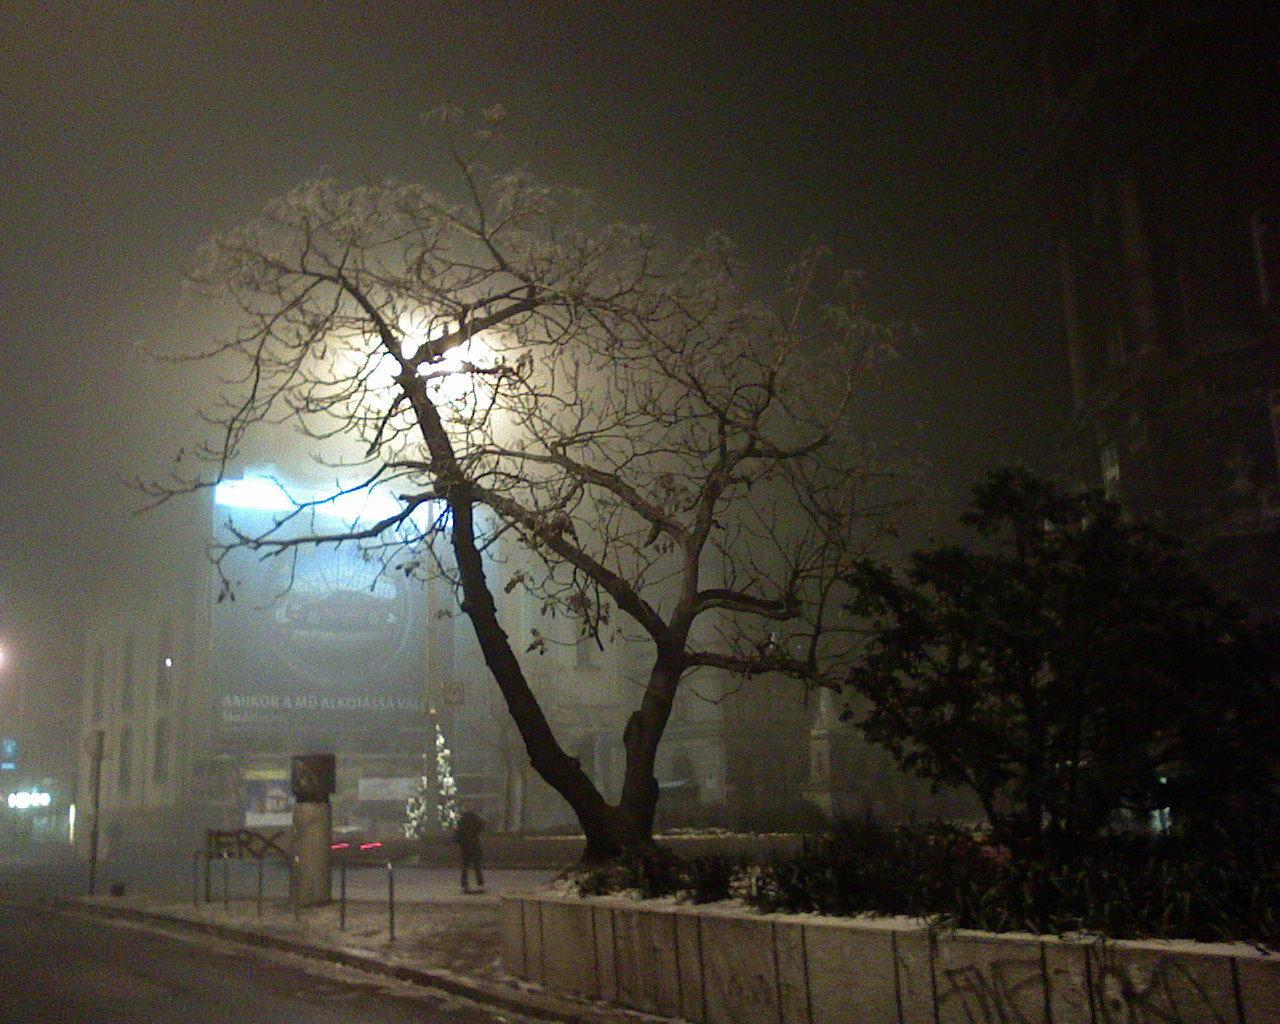 tree, illuminated, bare tree, transportation, night, fog, street light, outdoors, branch, road, sky, nature, no people, beauty in nature, city